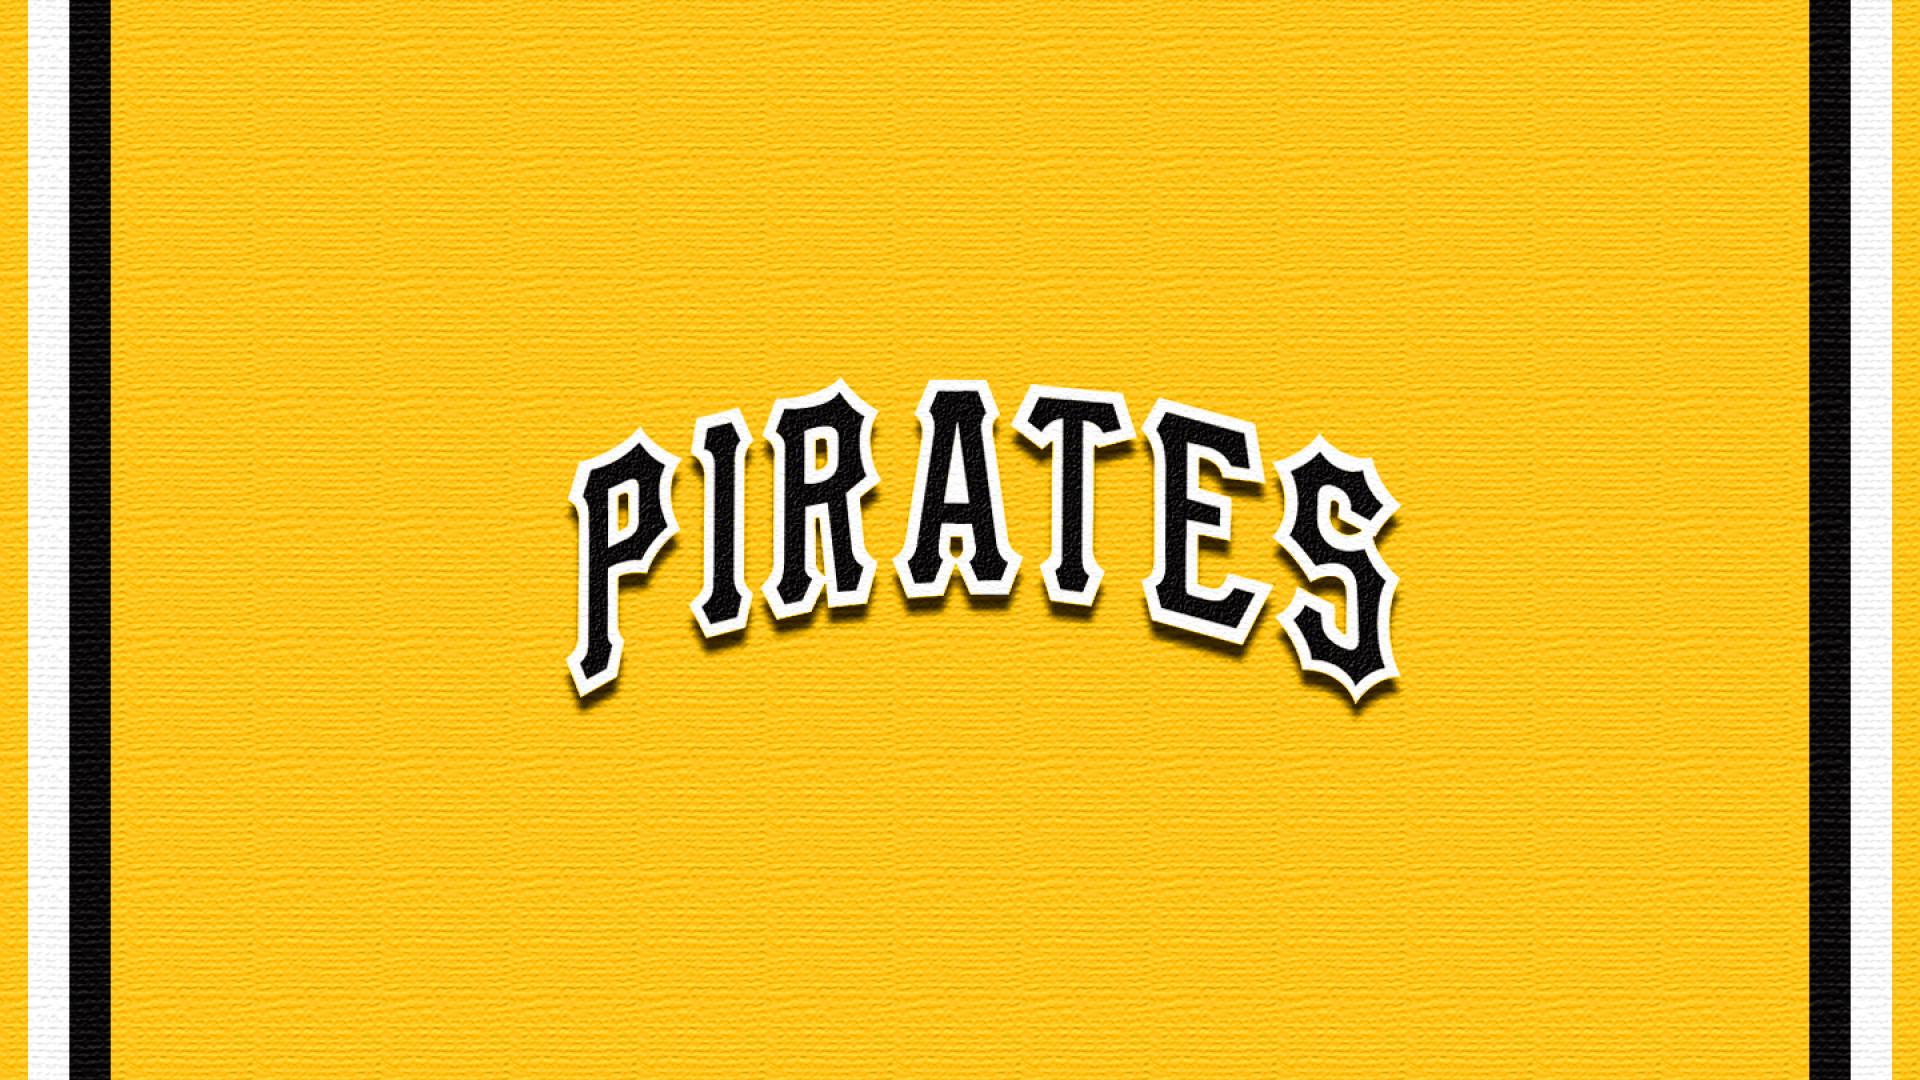 Pittsburgh Pirates Logo Wallpapers Hd Pixelstalk Net